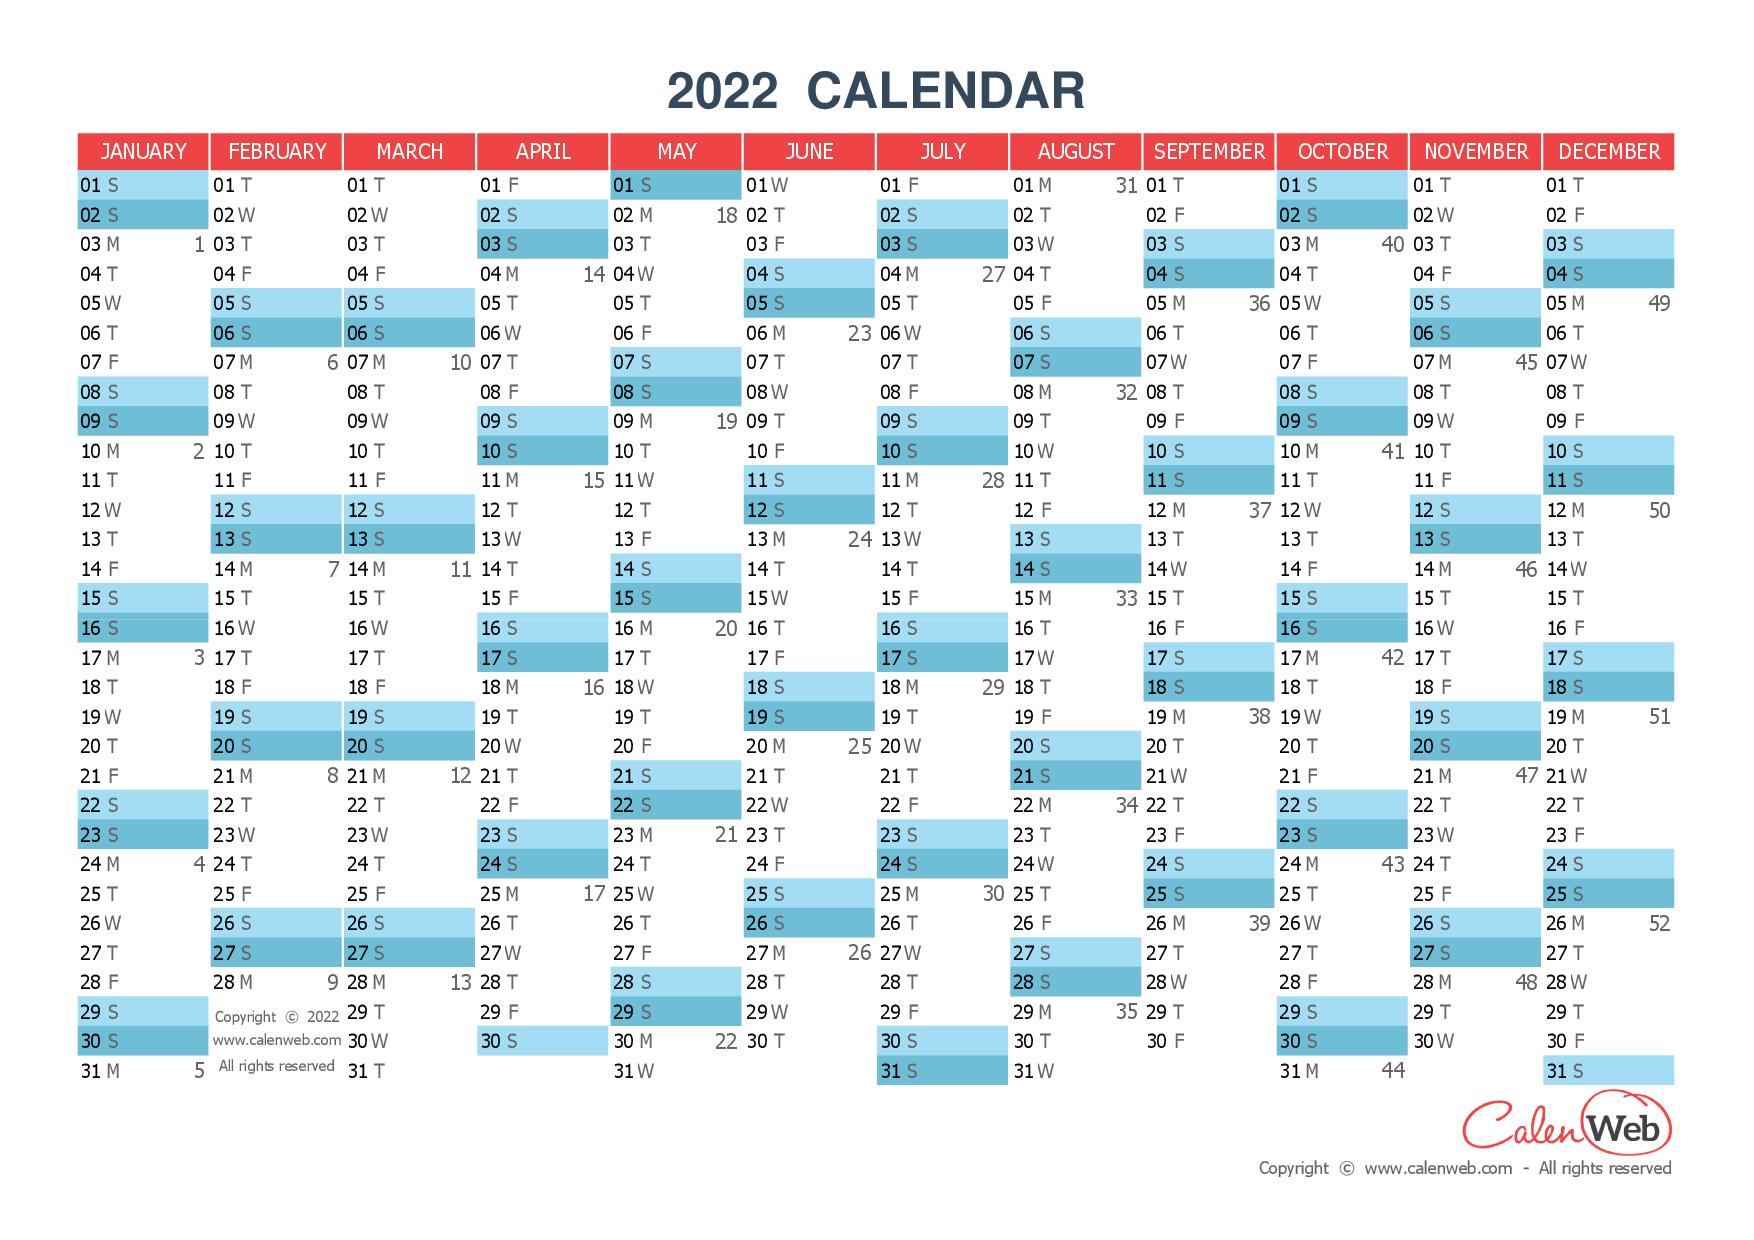 Calendrier 2022 Calenweb Yearly calendar – Year 2022 Yearly horizontal planning   Calenweb.com